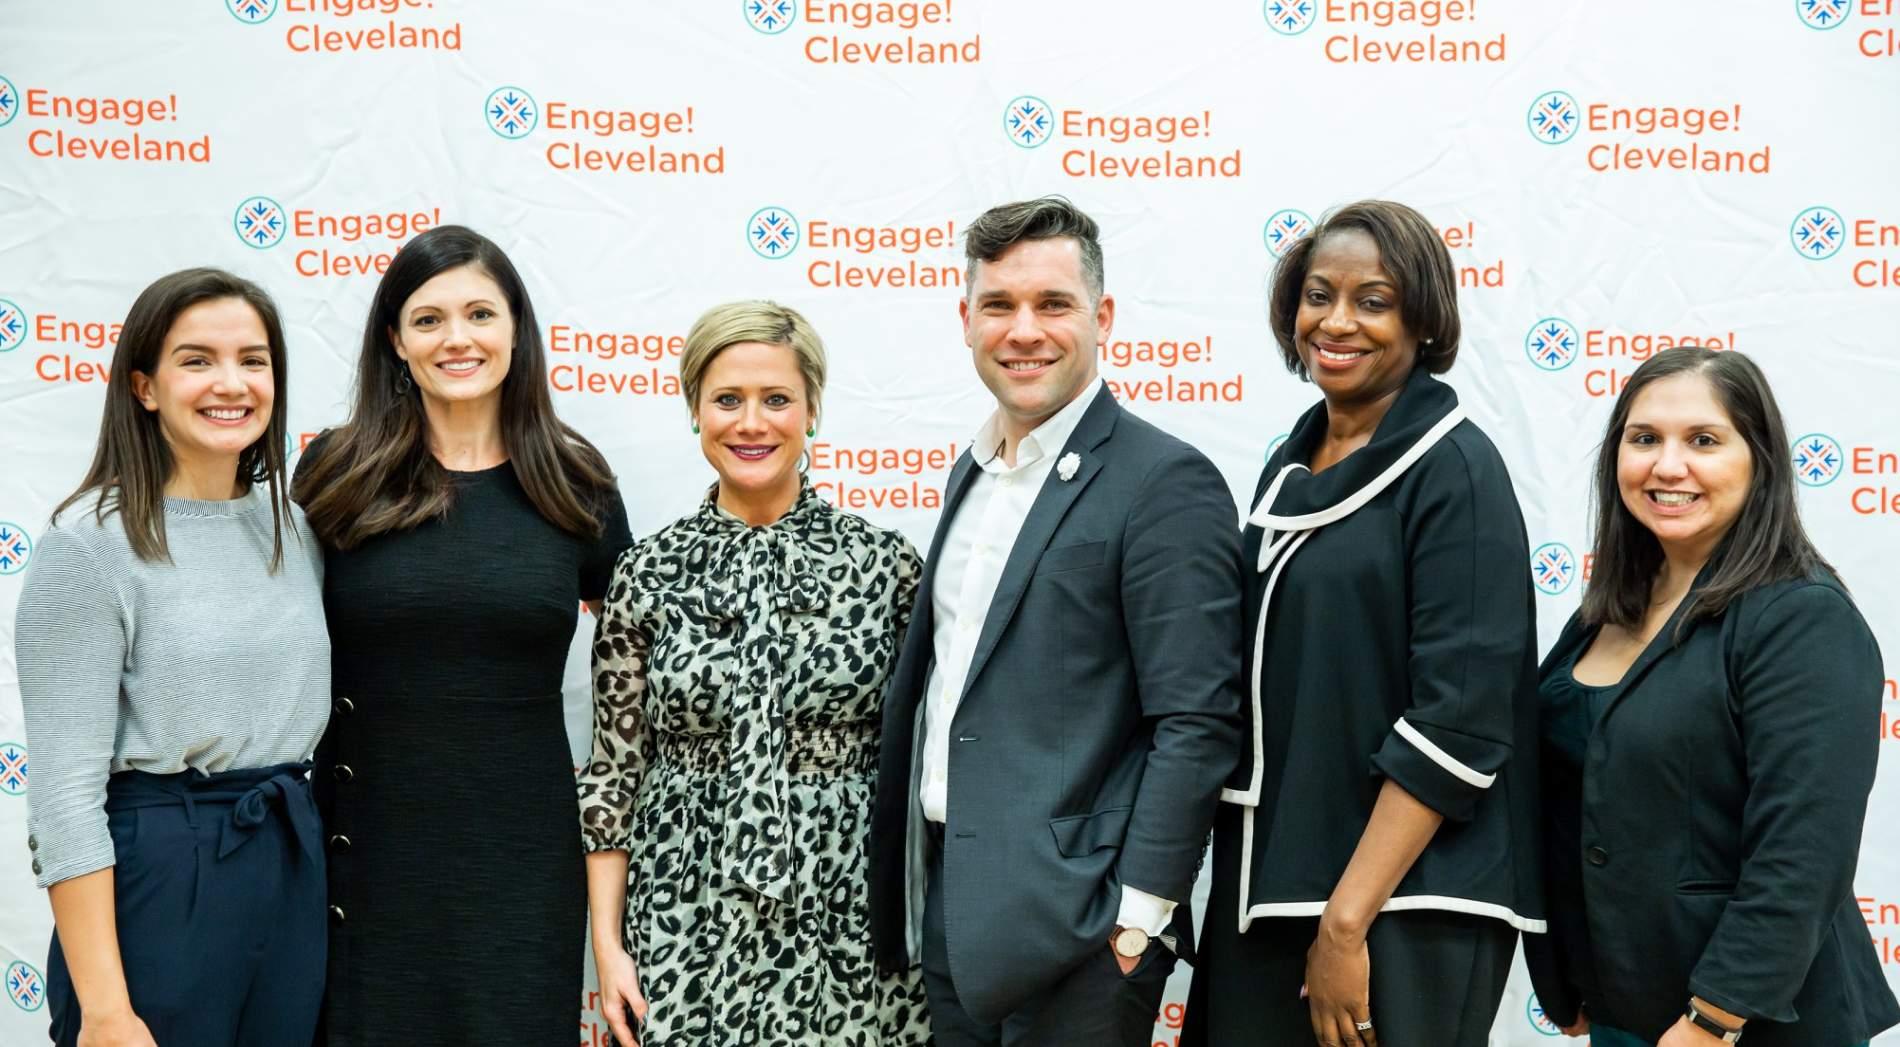 Engage Cleveland YP Oswald Companies Schmitz